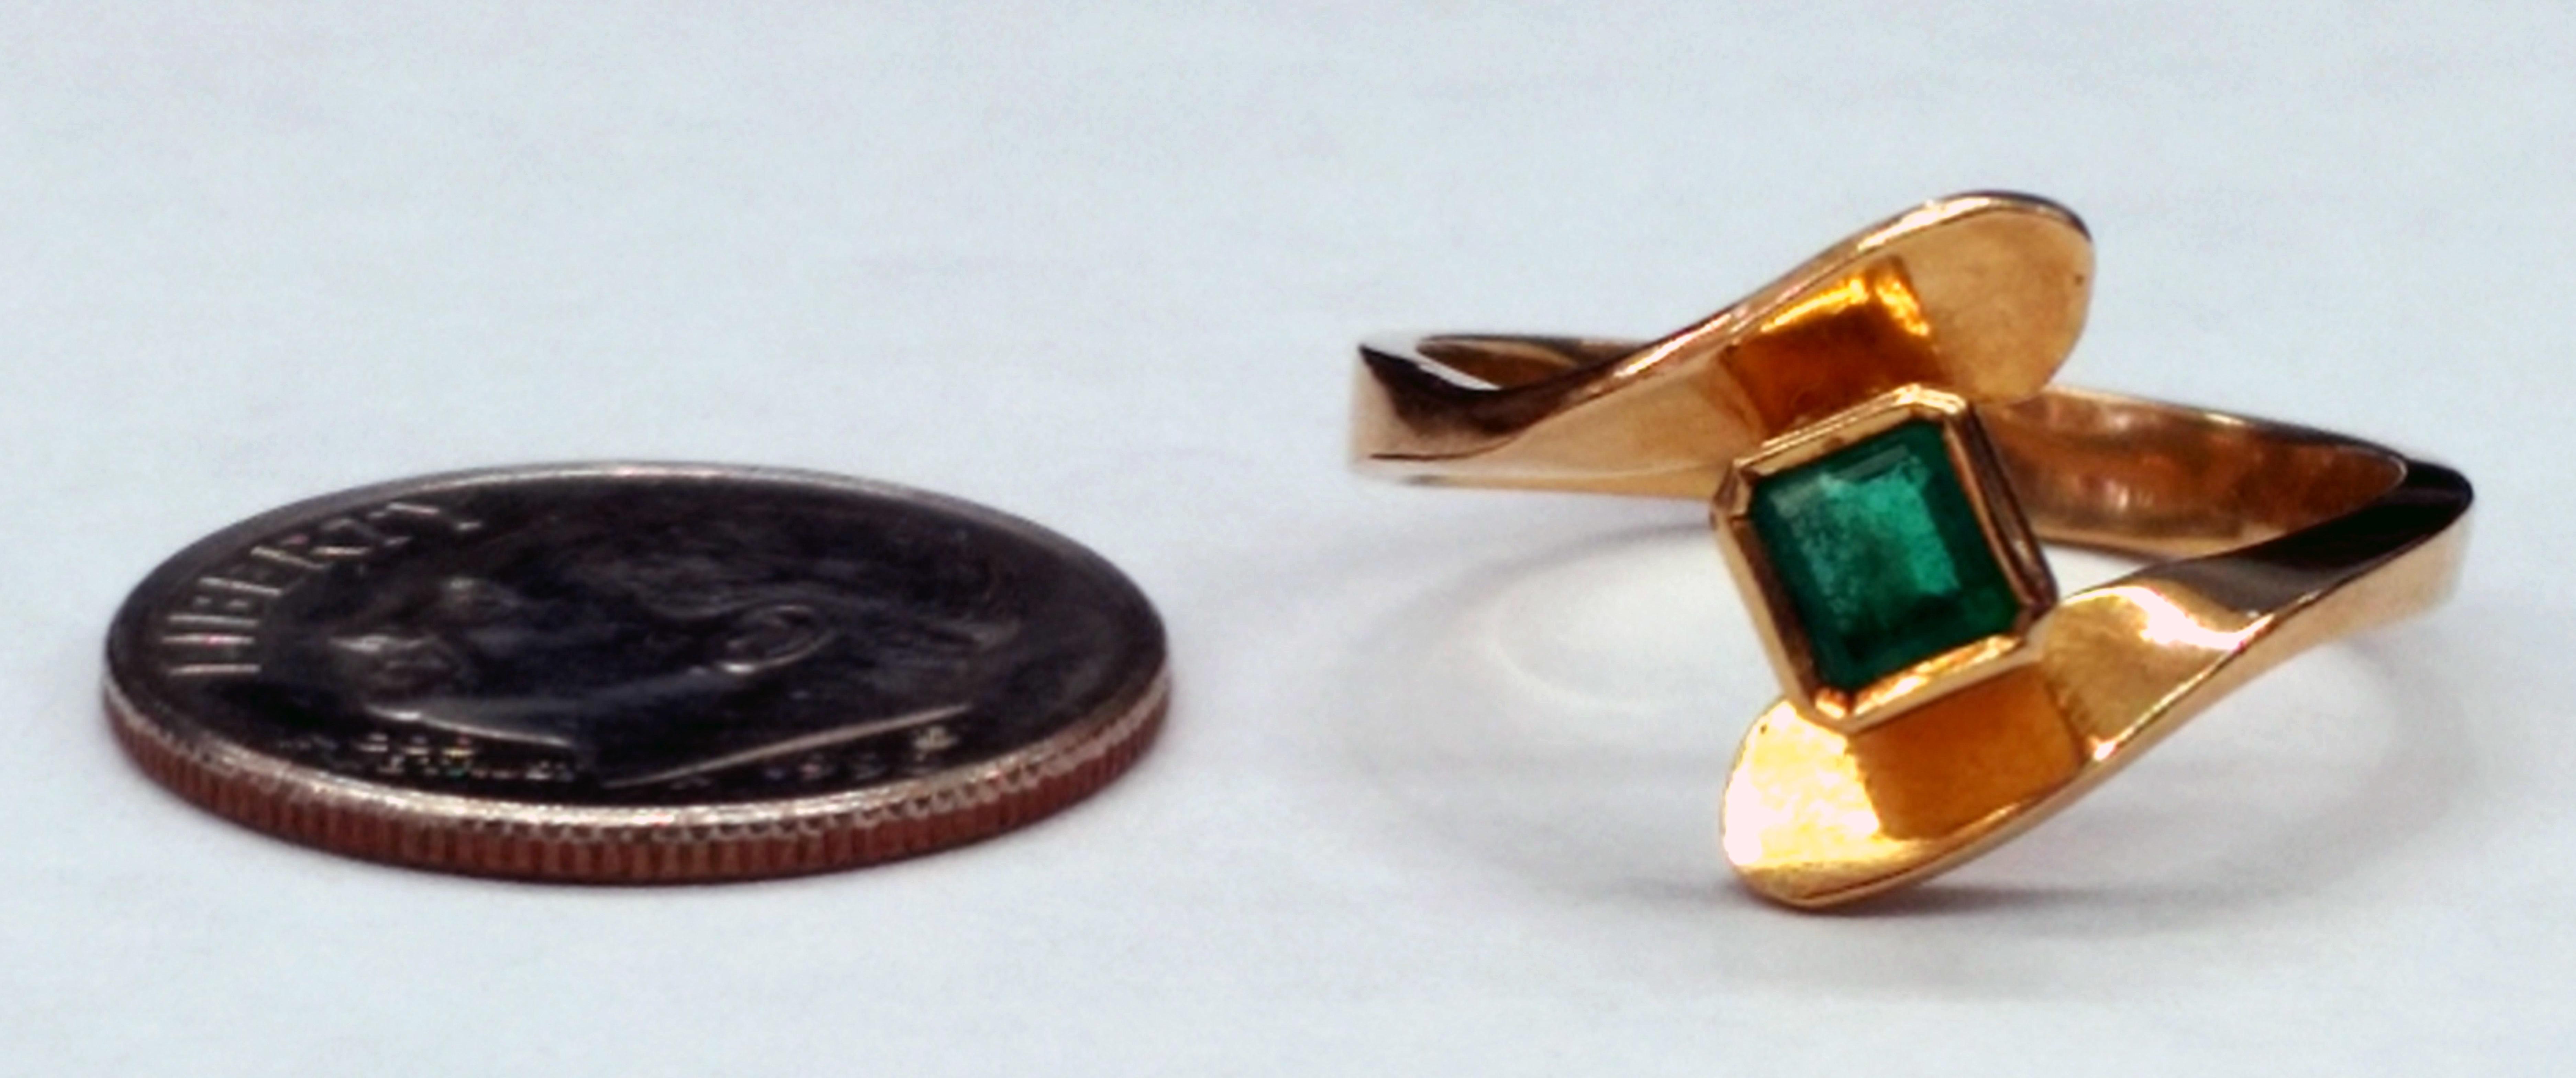 Emerald Cut Emerald 14kt Yellow Gold Bypass Ring - Size 6 1/2